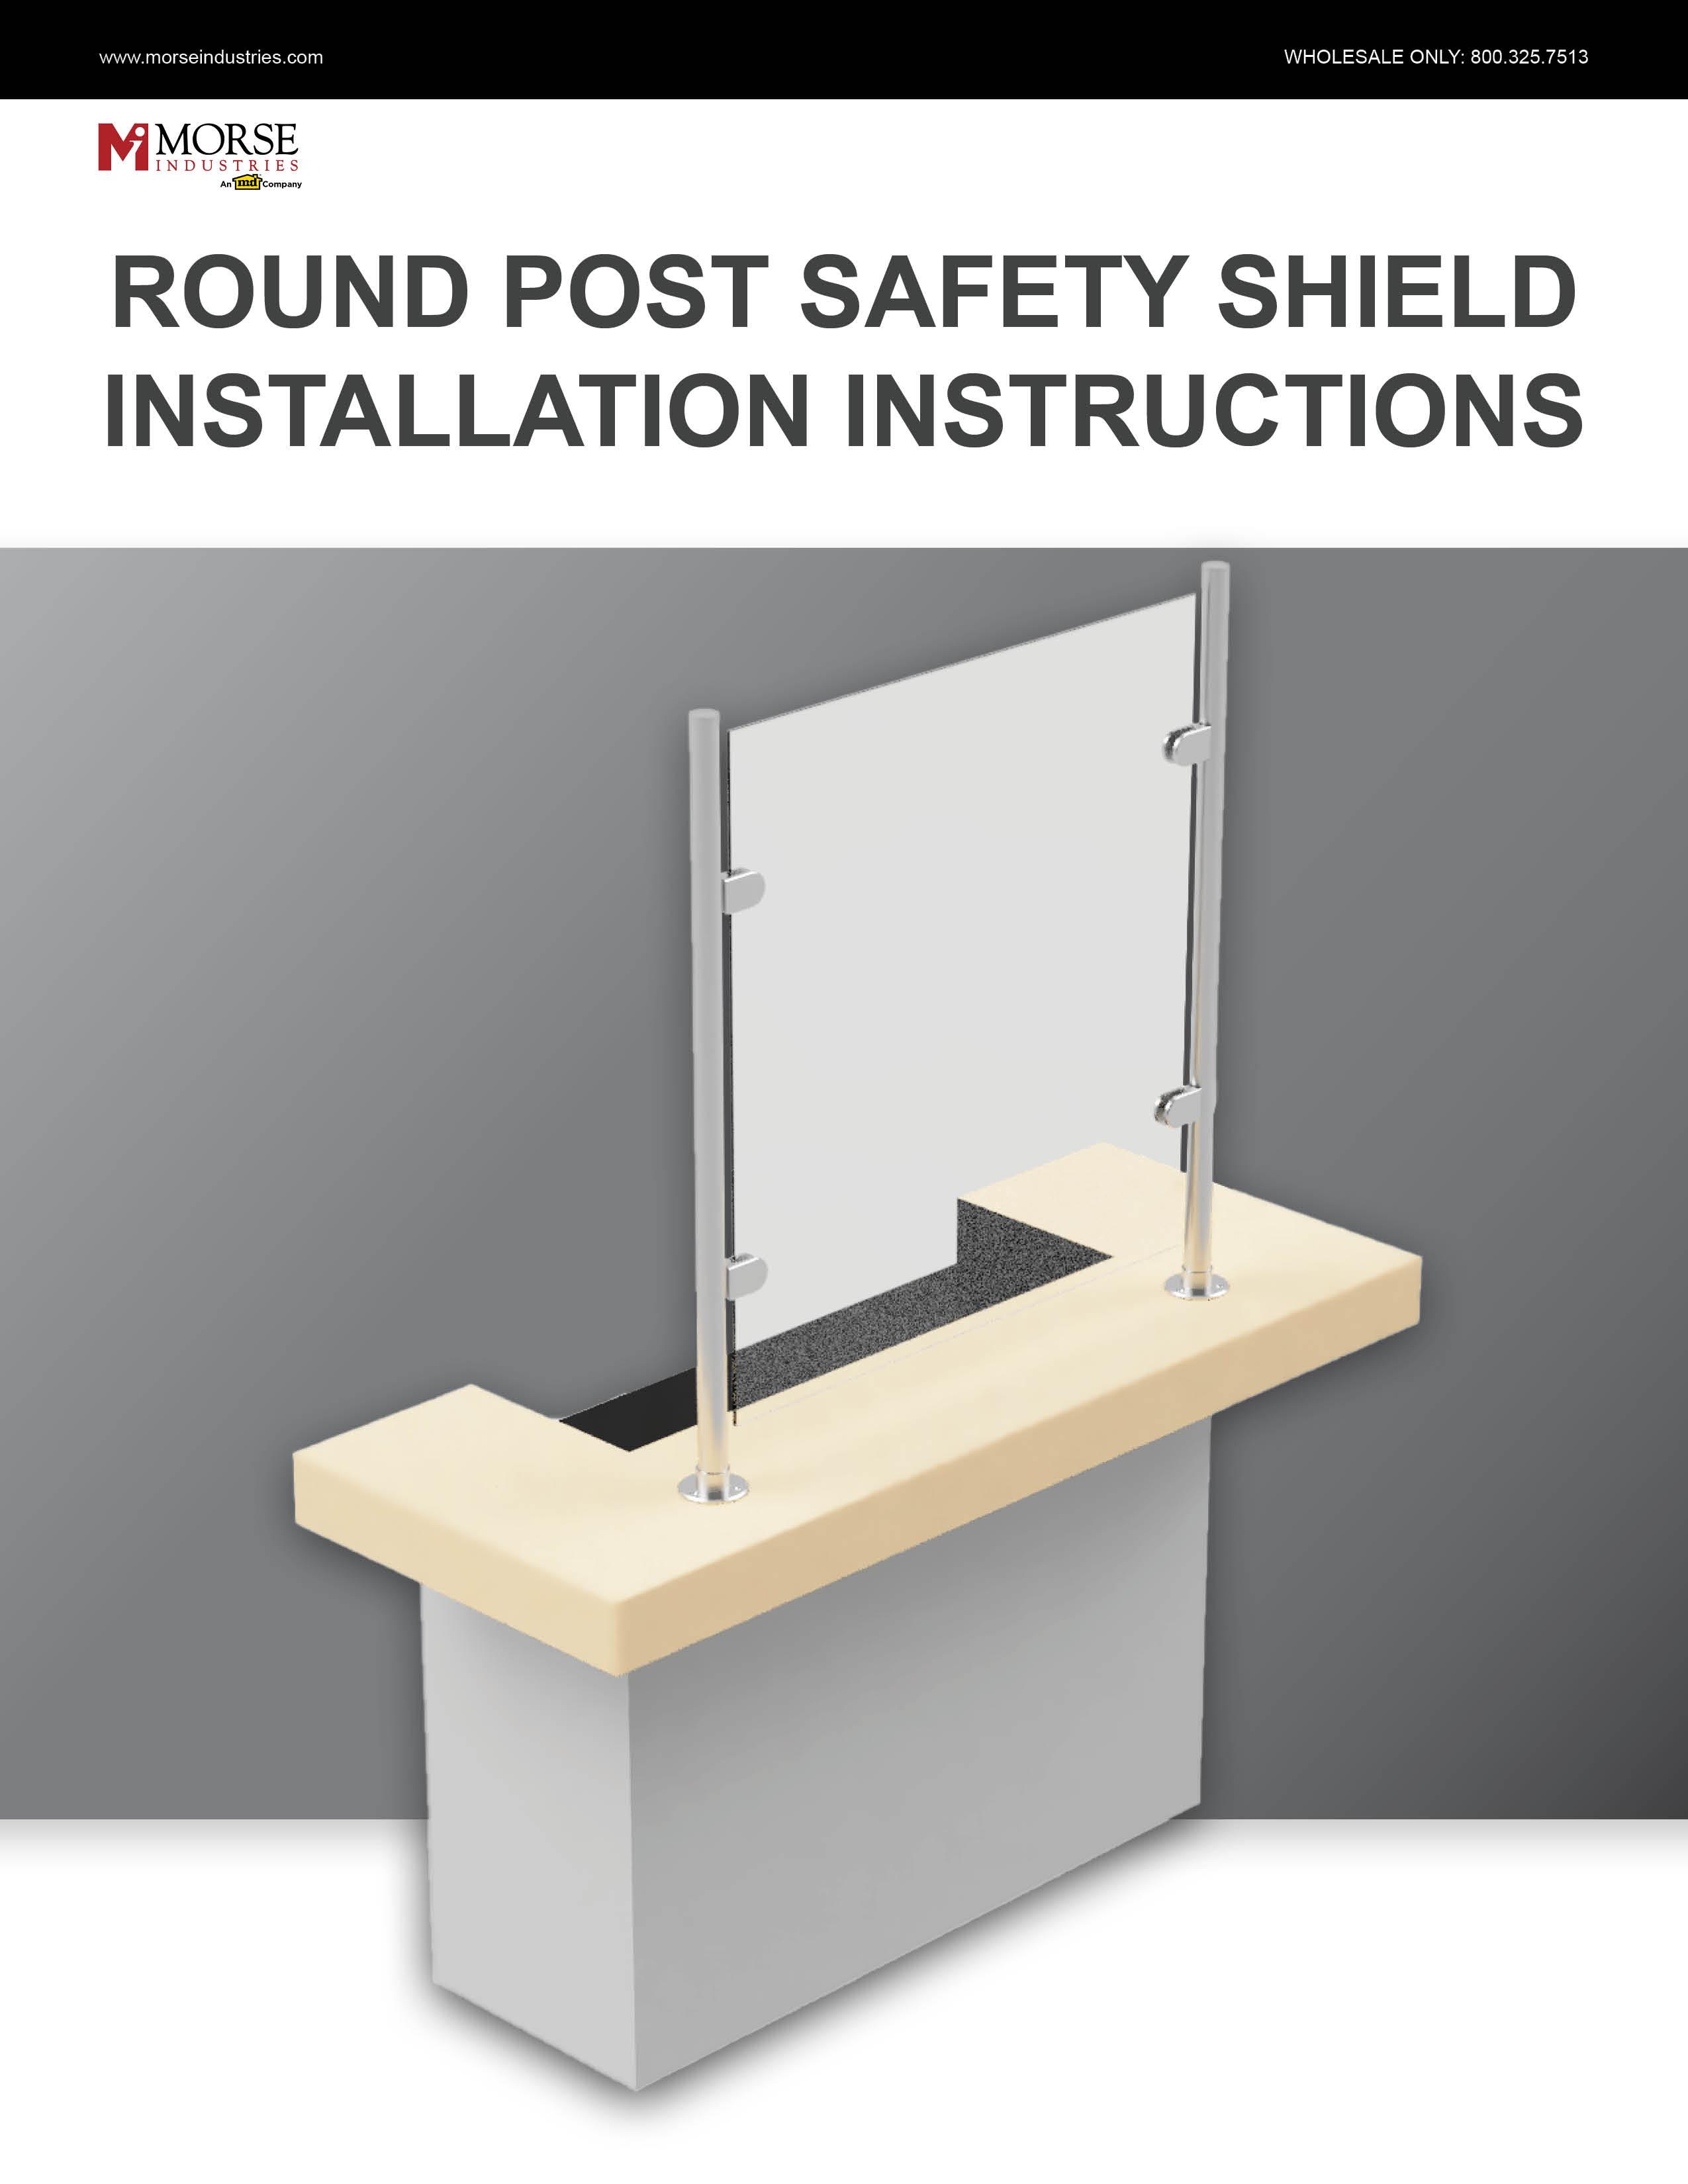 Round Post Safety Shield Installation Instructions